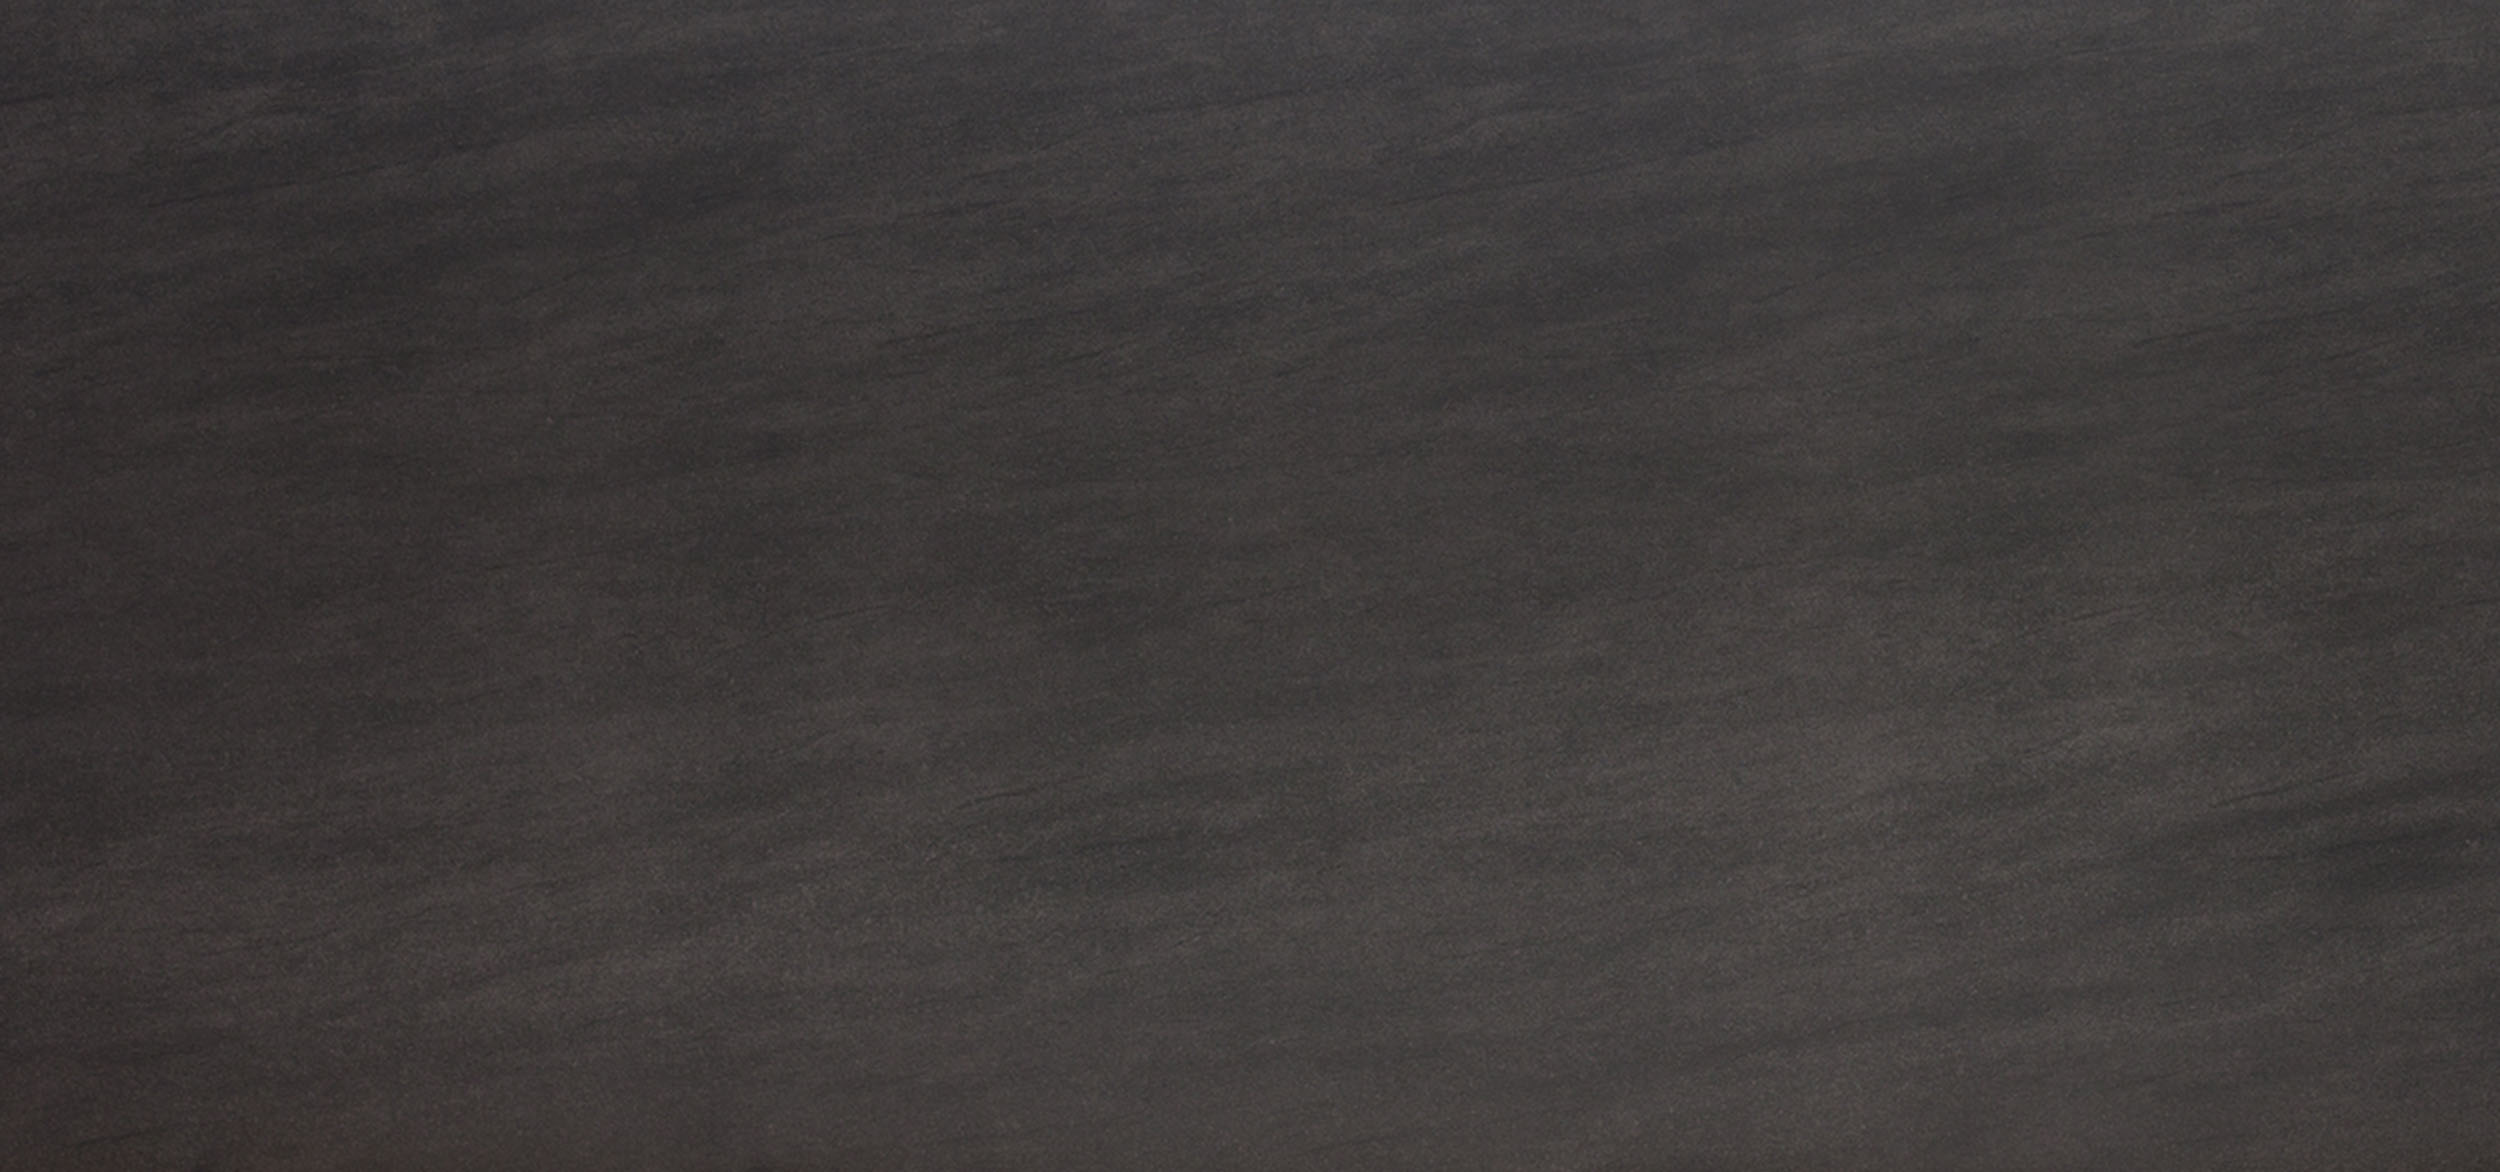 basalt-black.jpg